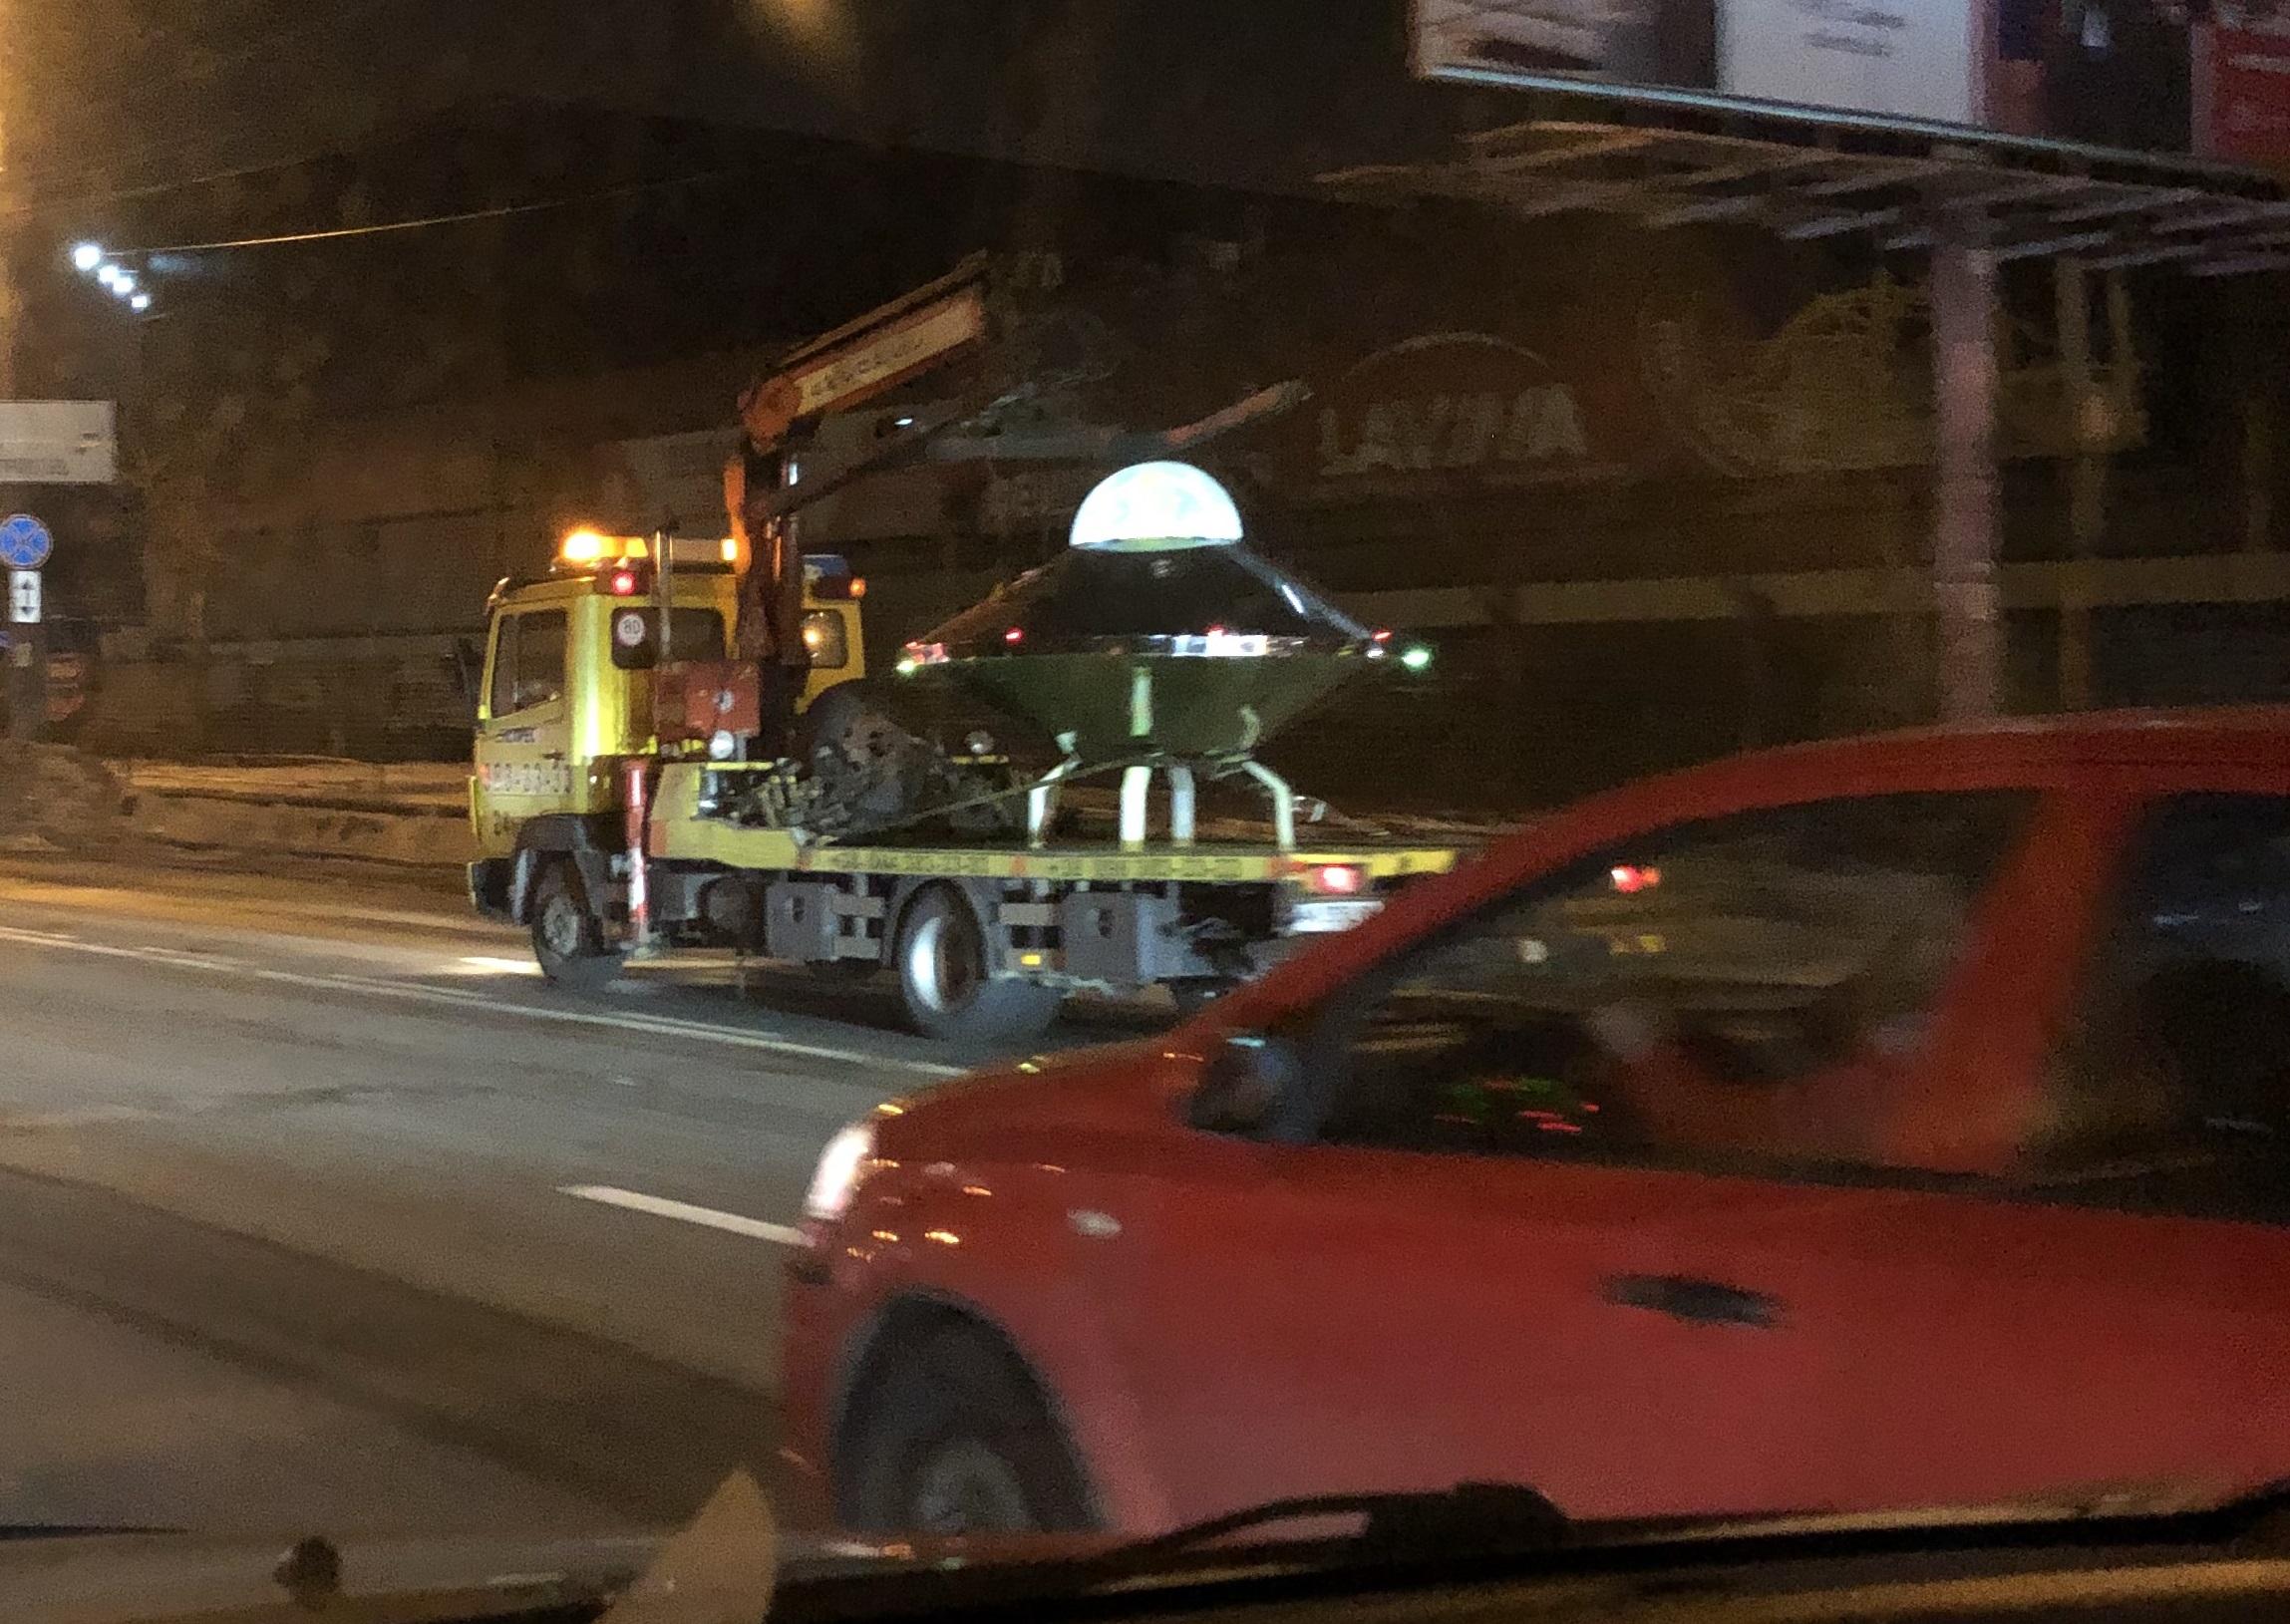 В Киеве очевидец заснял НЛО с пришельцем (ФОТО)